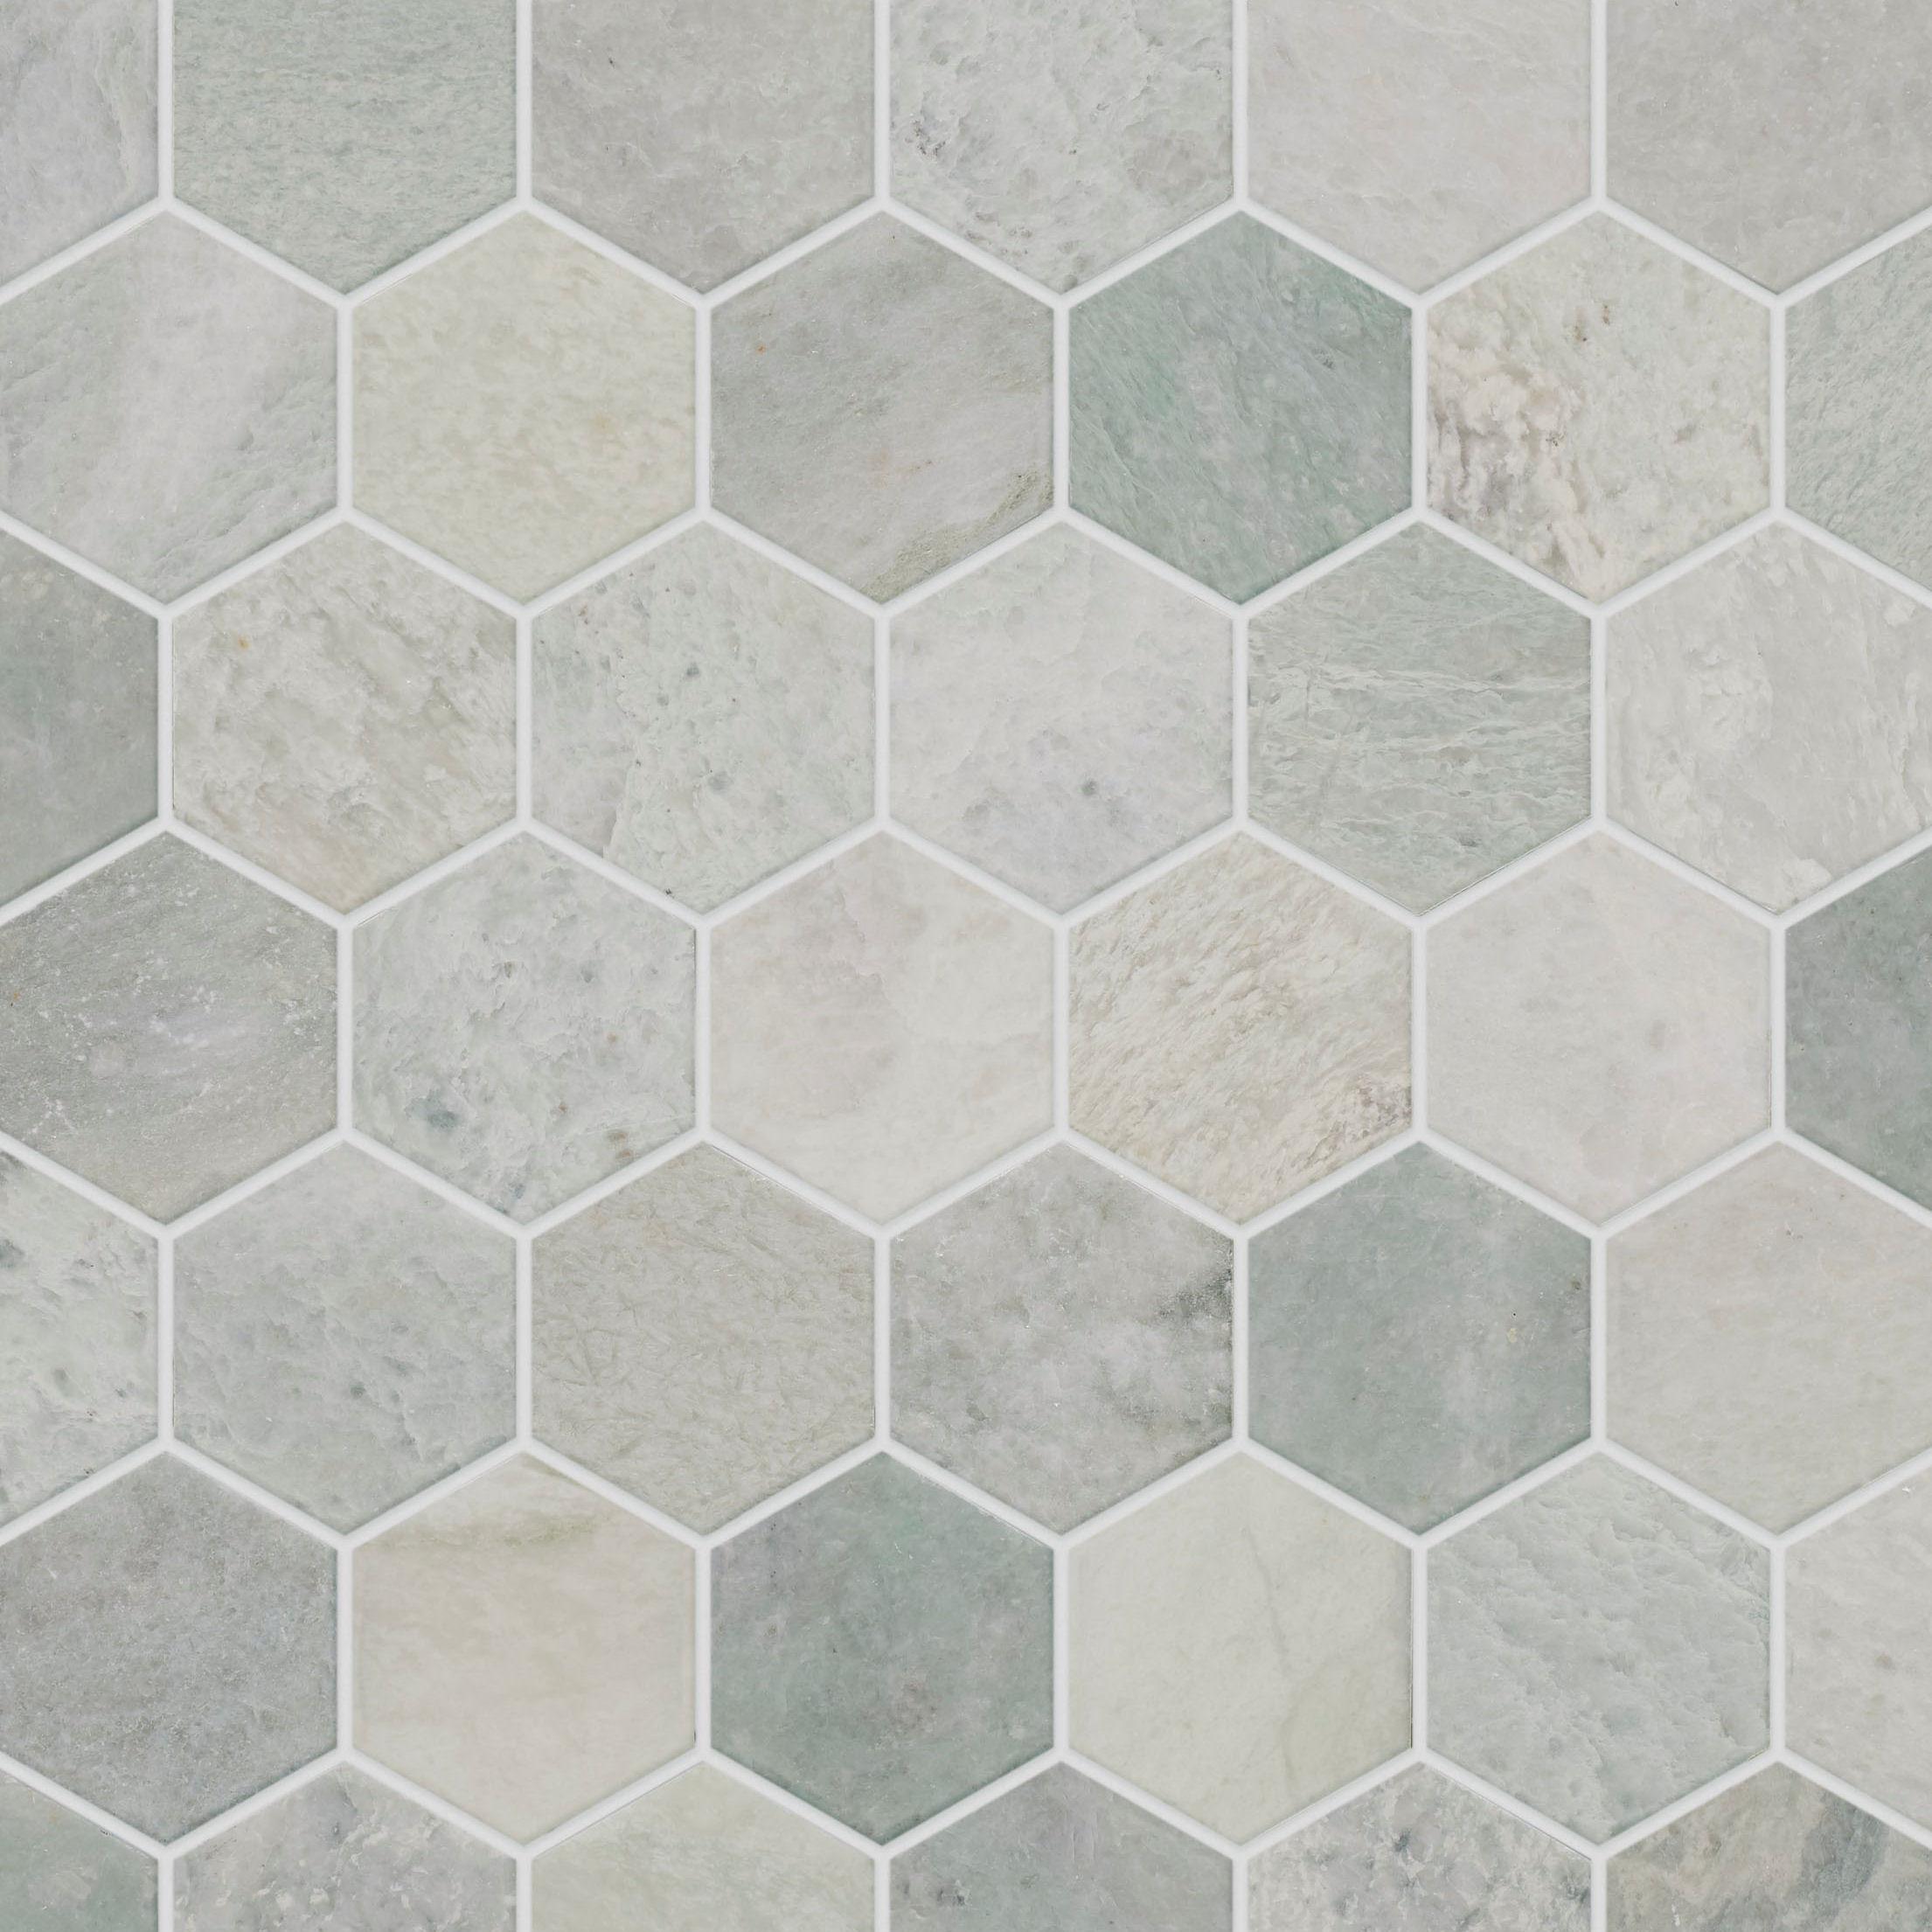 Verbena Honed Marble Hexagon Mosaic Tiles Mandarin Stone